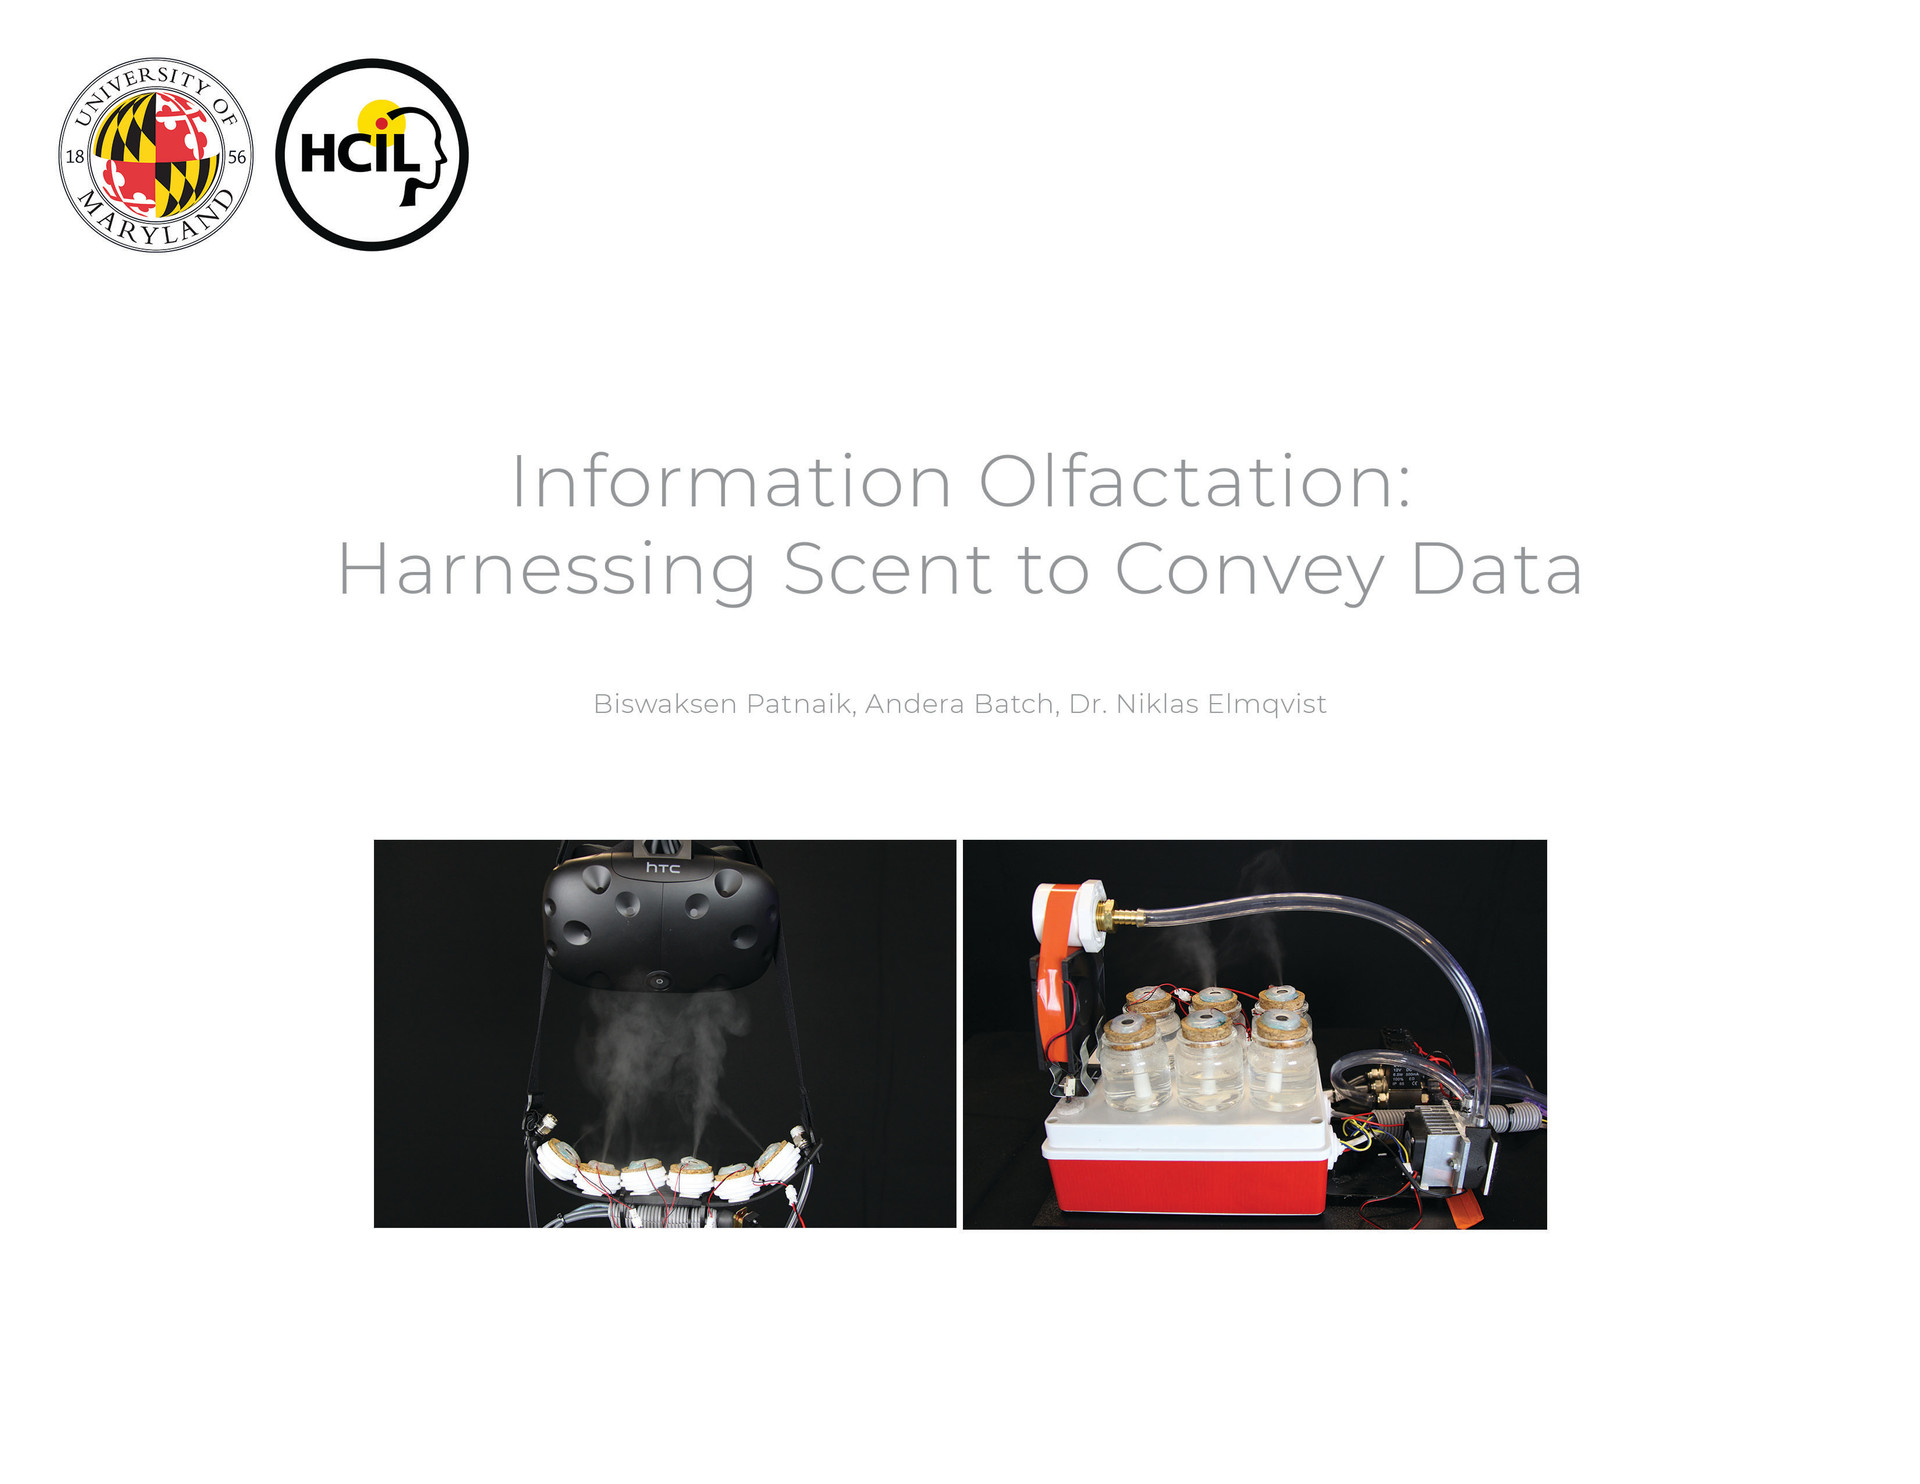 Information Olfactation1